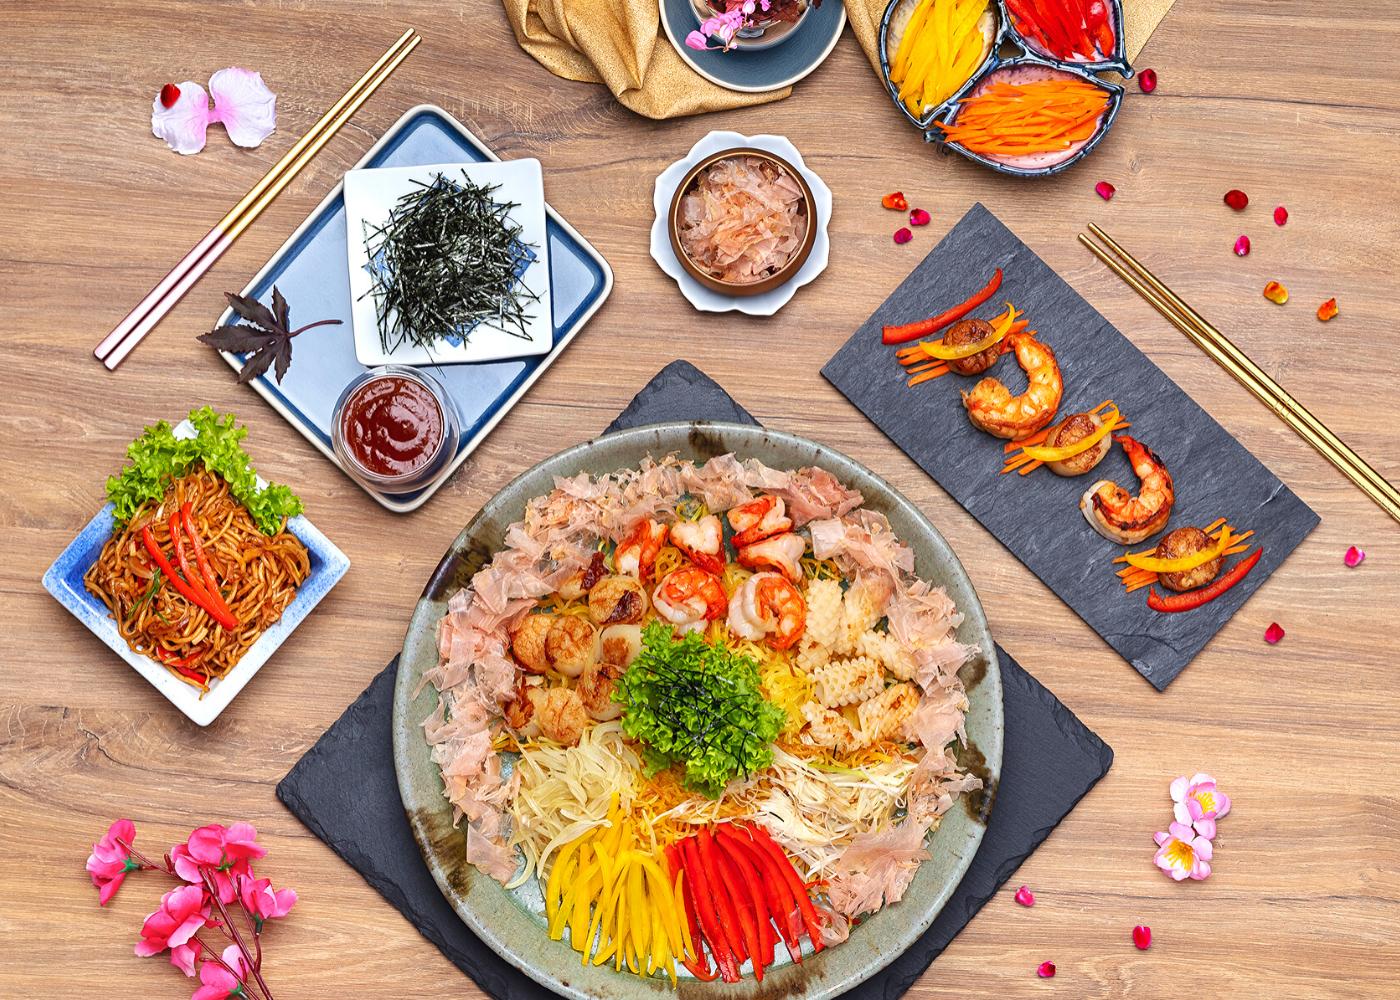 Photography: TEPPAN by Chef Yonemura